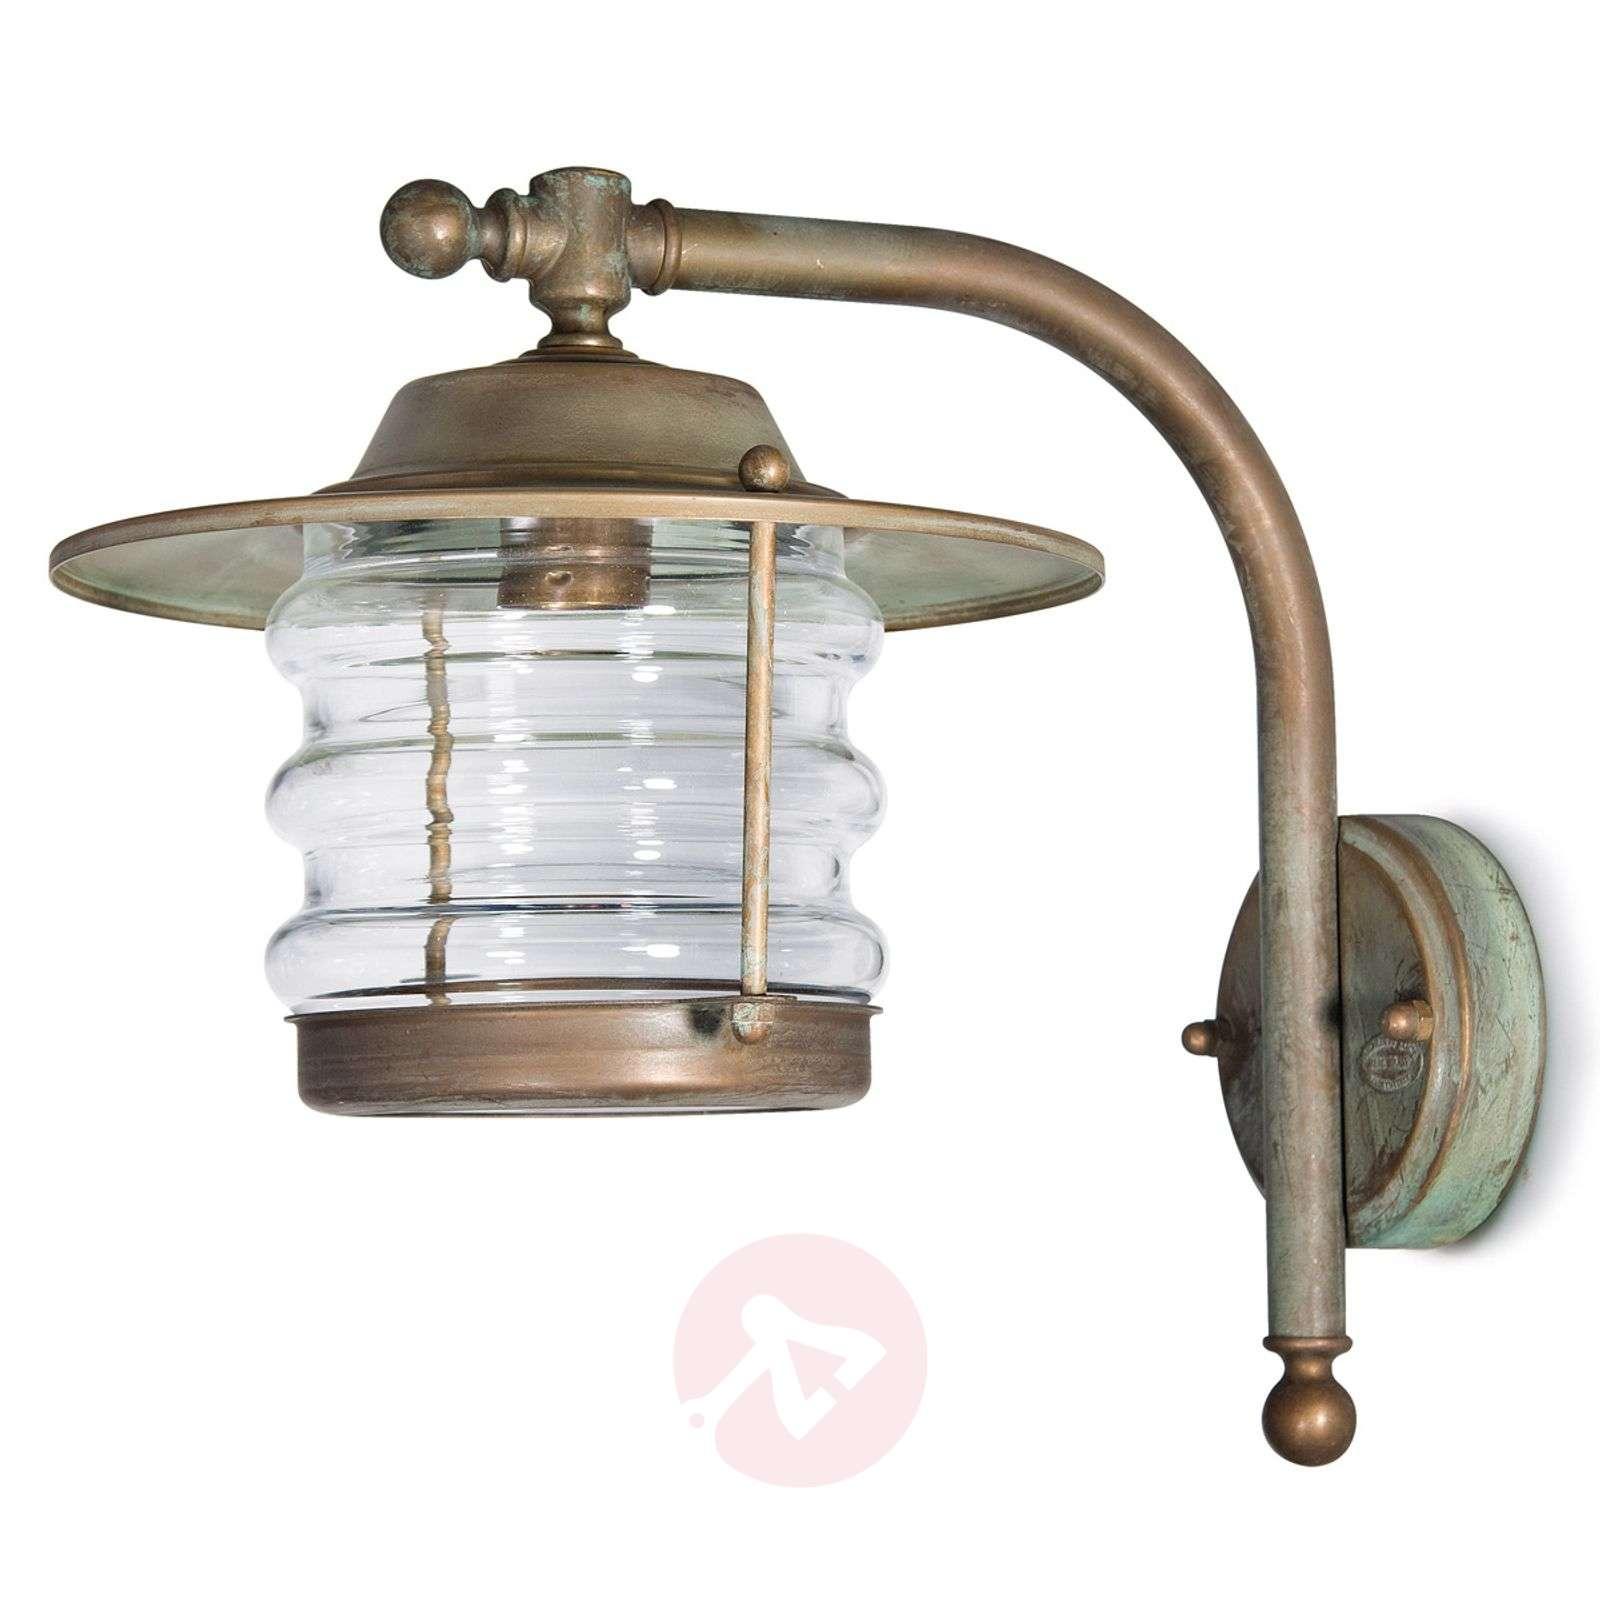 Seawater-res. lantern outdoor wall light Adessora-6515255-01